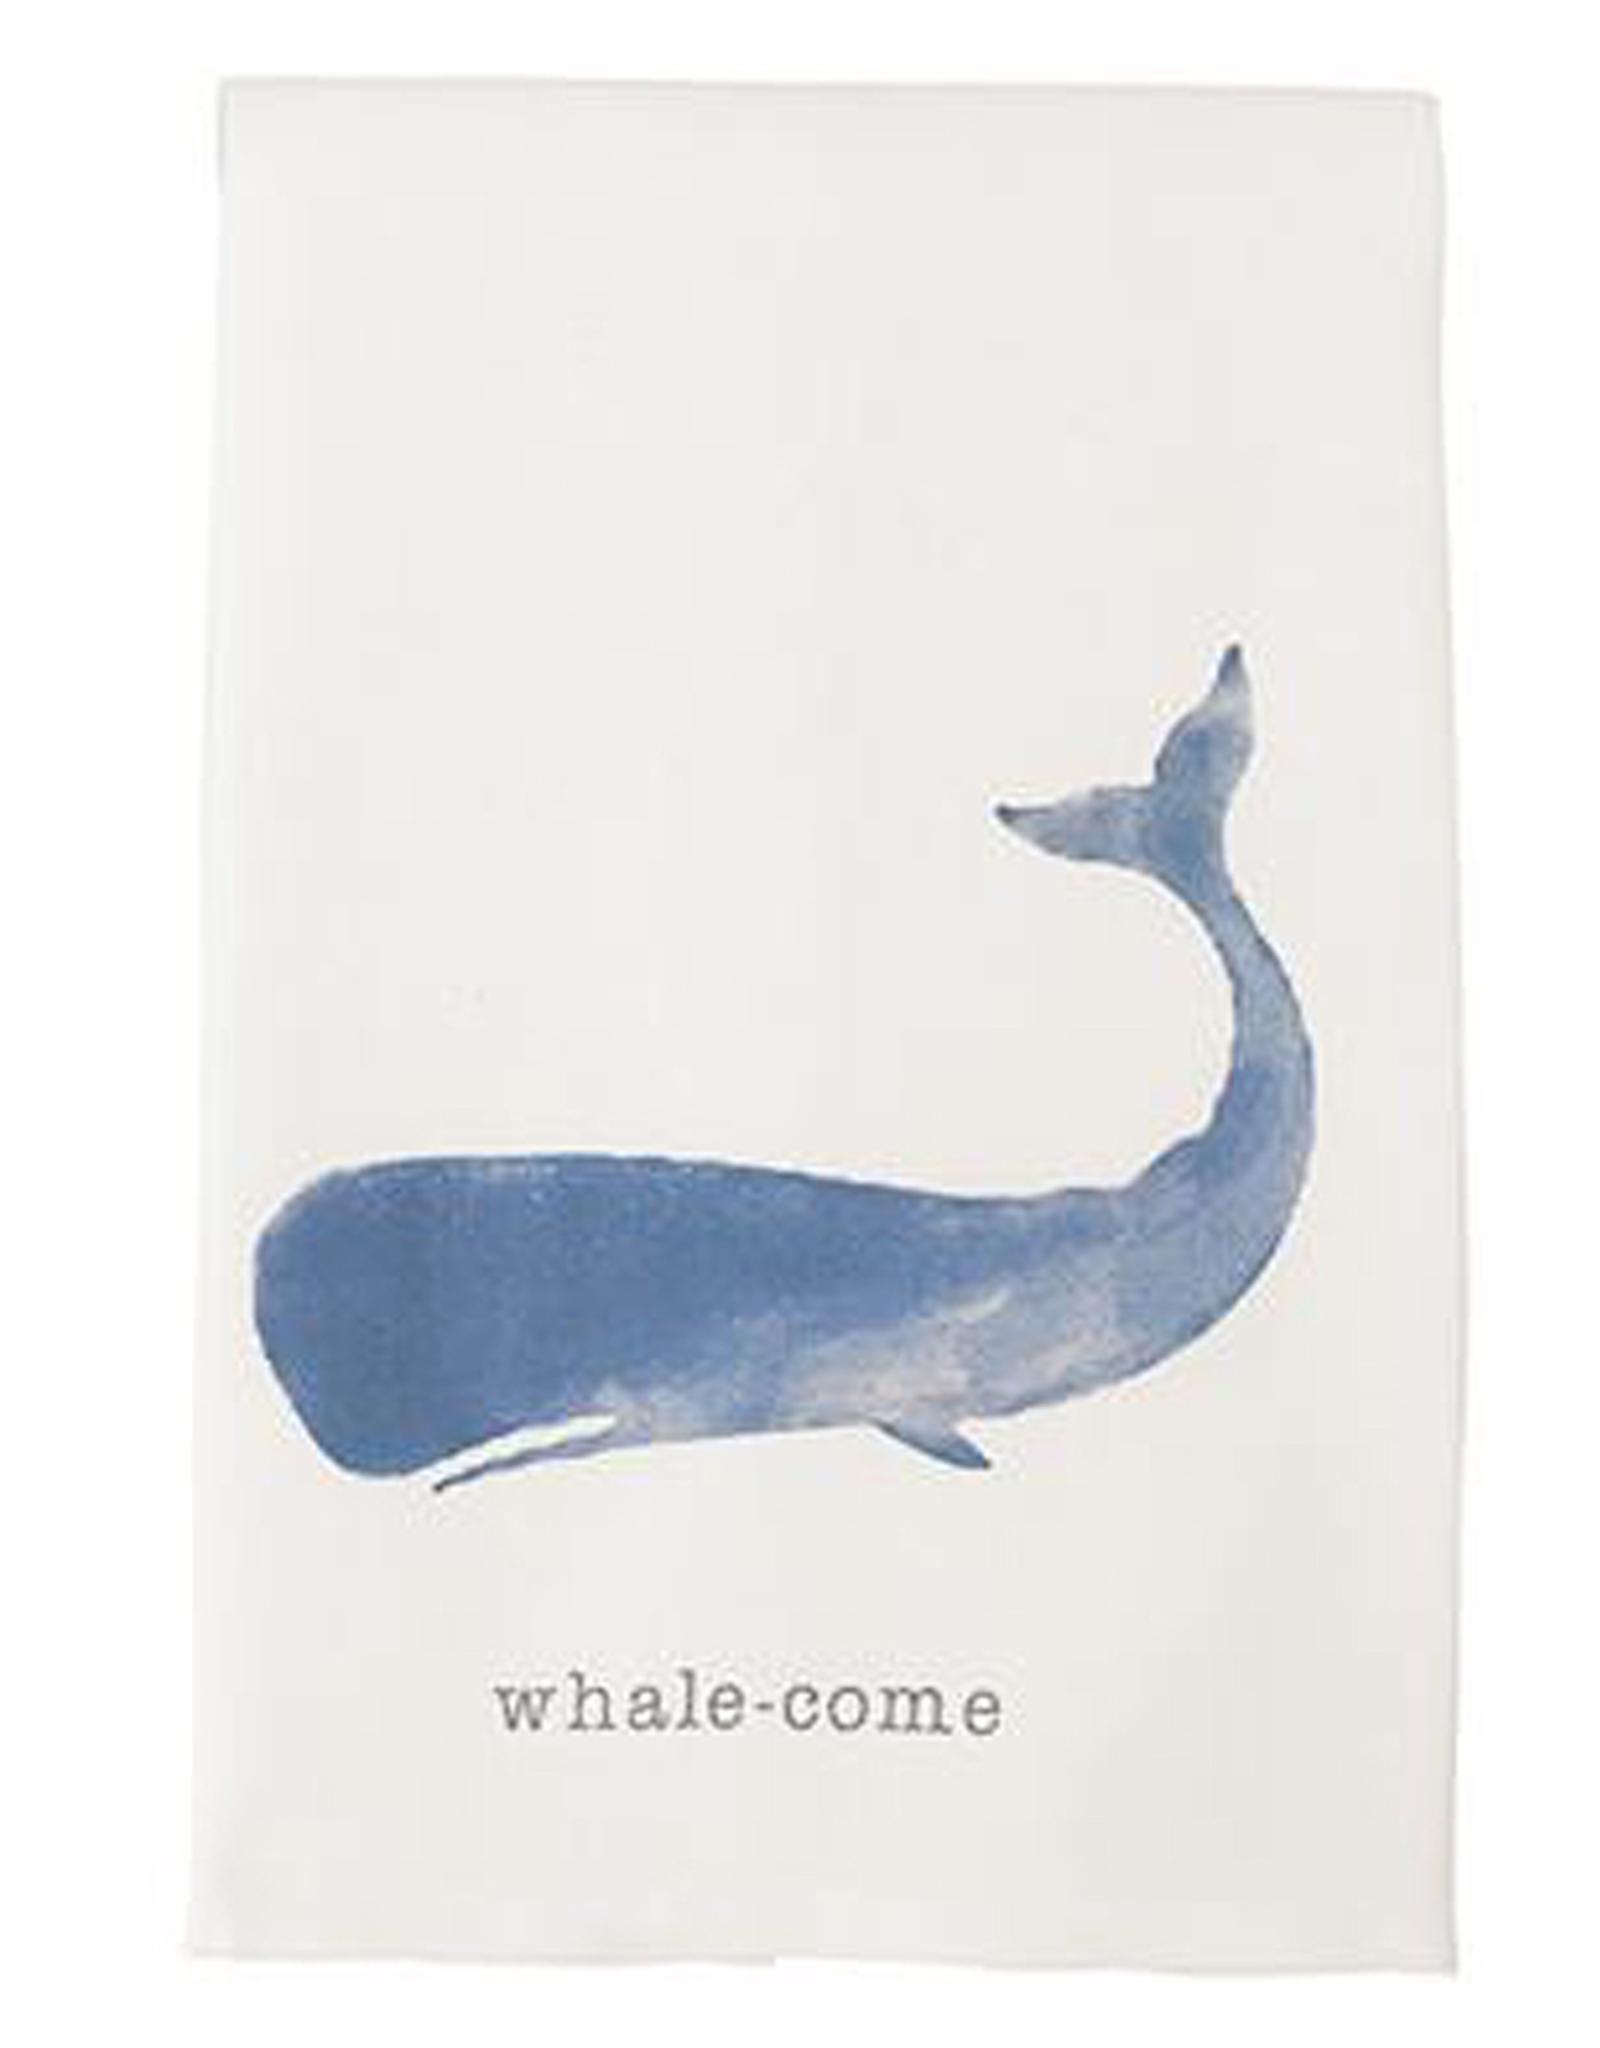 Mud Pie Beach House Nautical Dish Towel w Whale - Whale-come